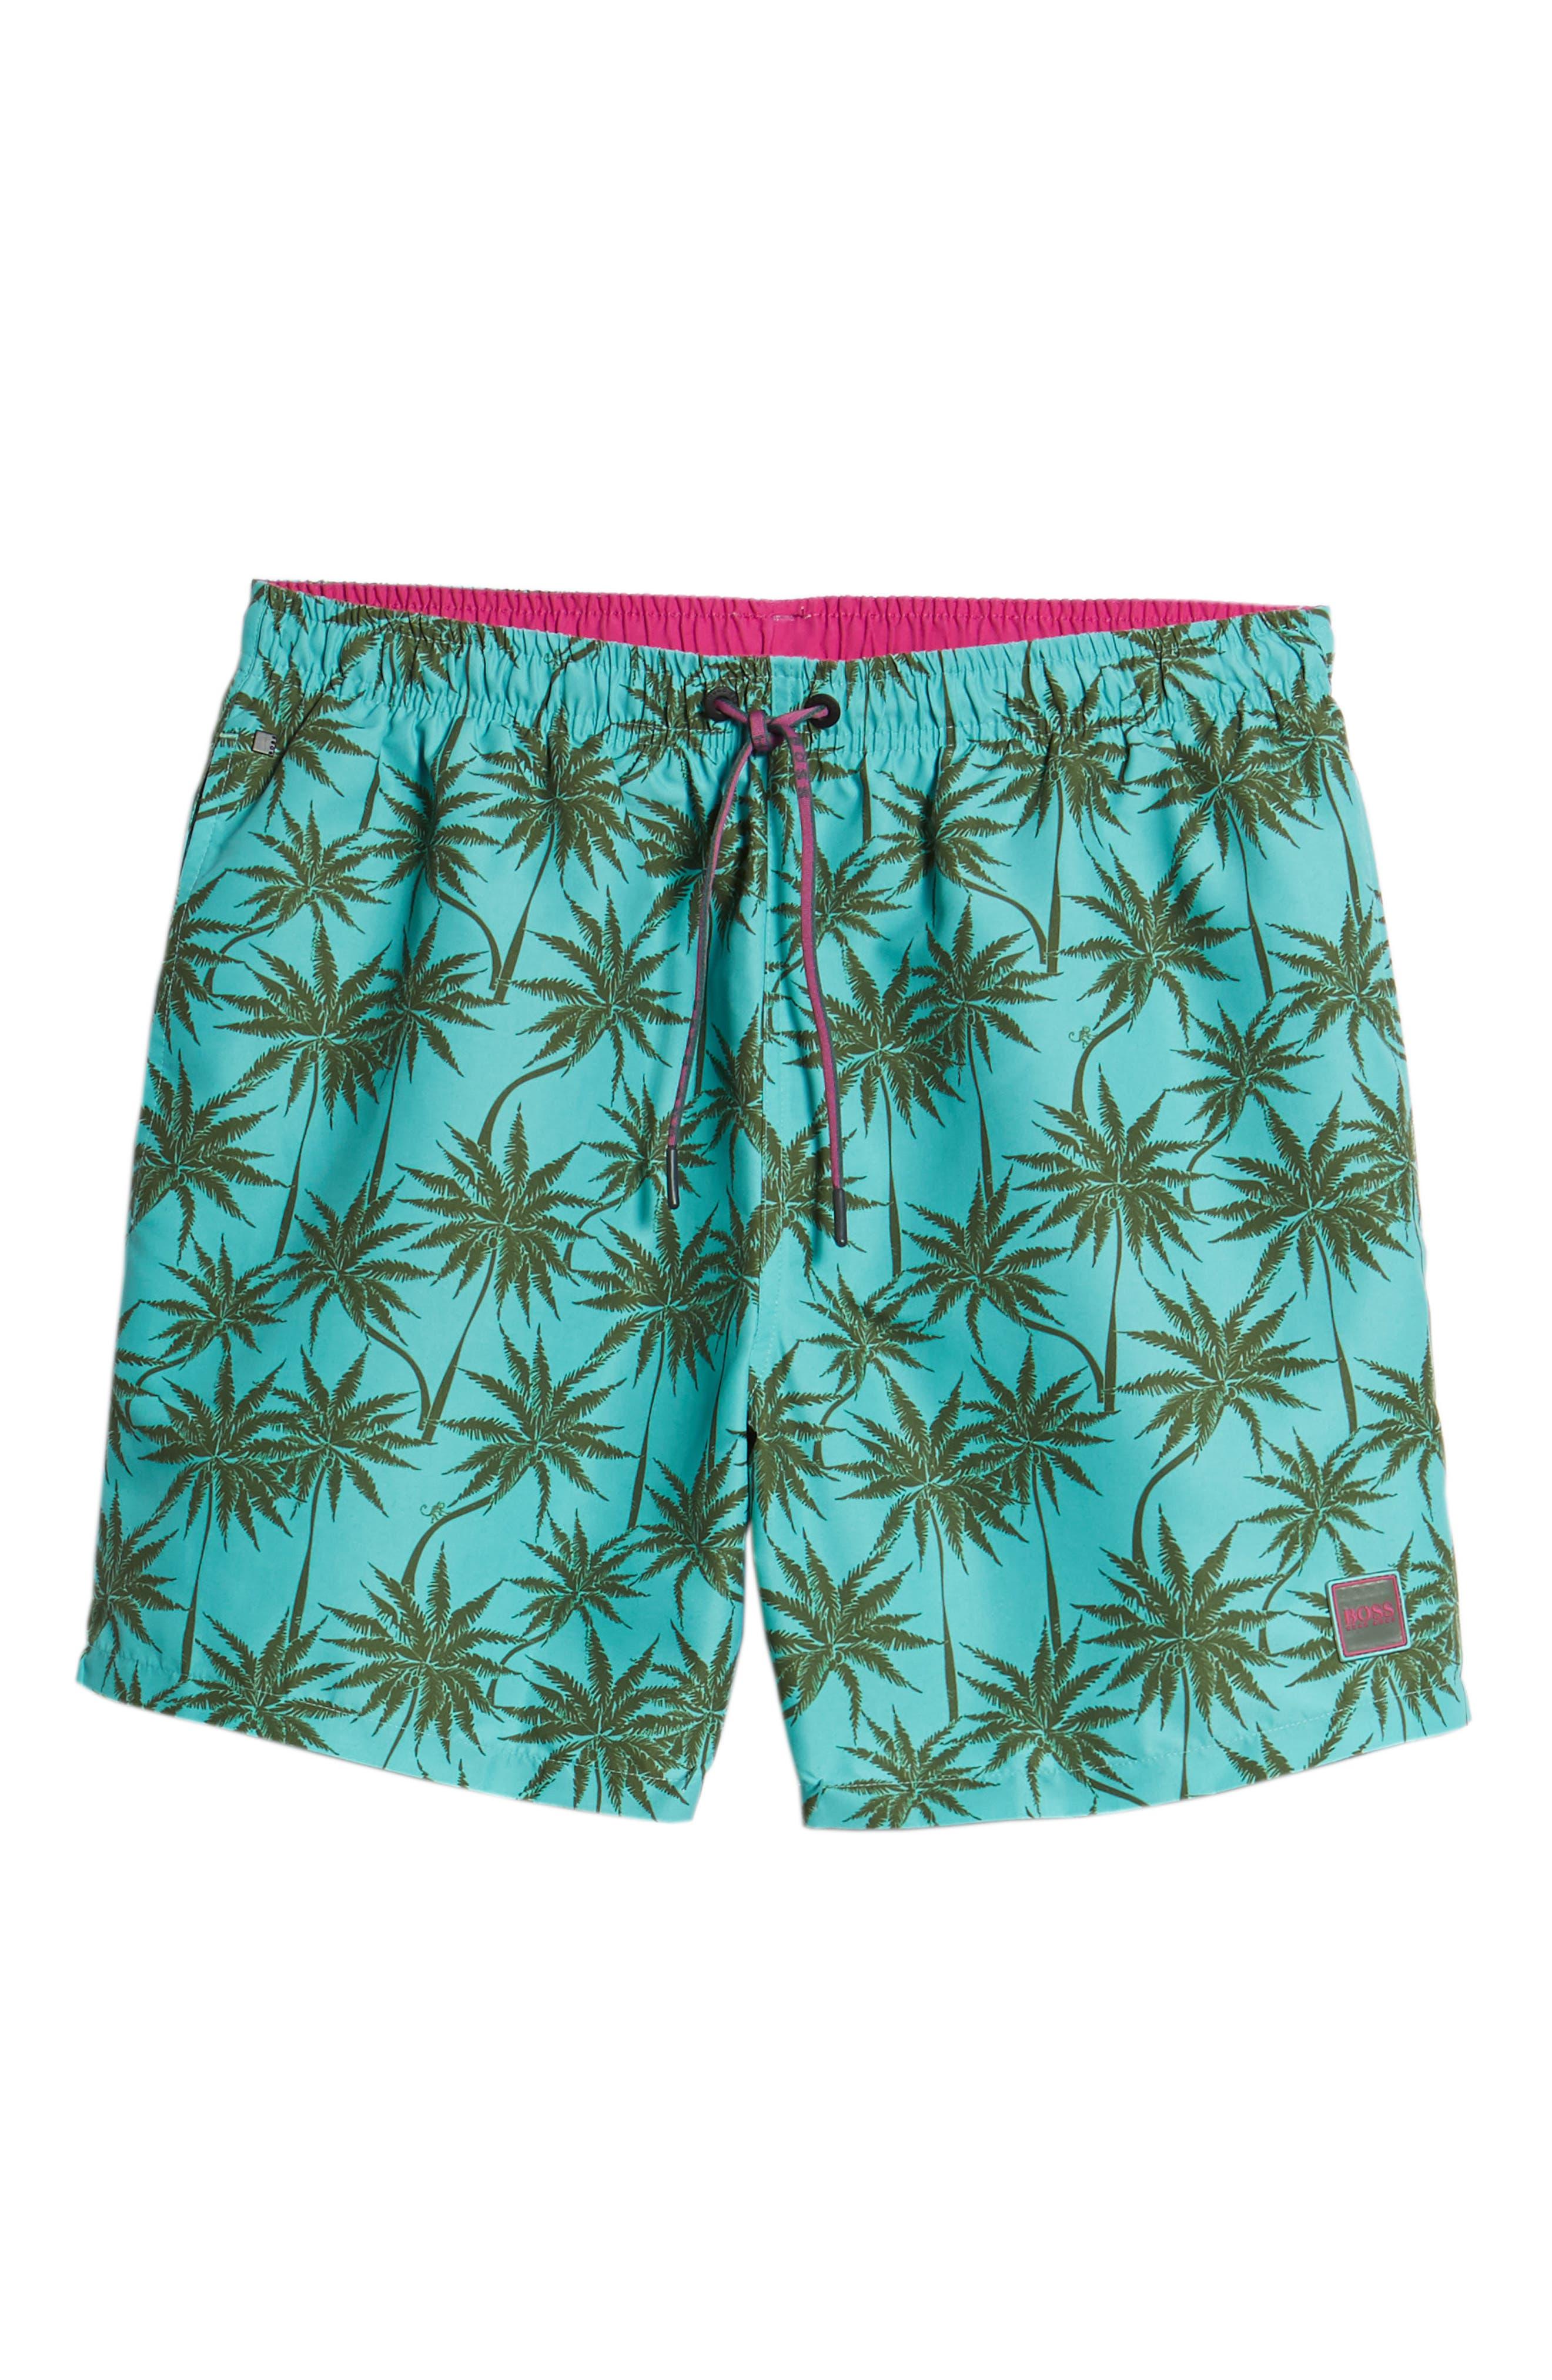 Piranha Palm Tree Swim Trunks,                             Alternate thumbnail 6, color,                             483